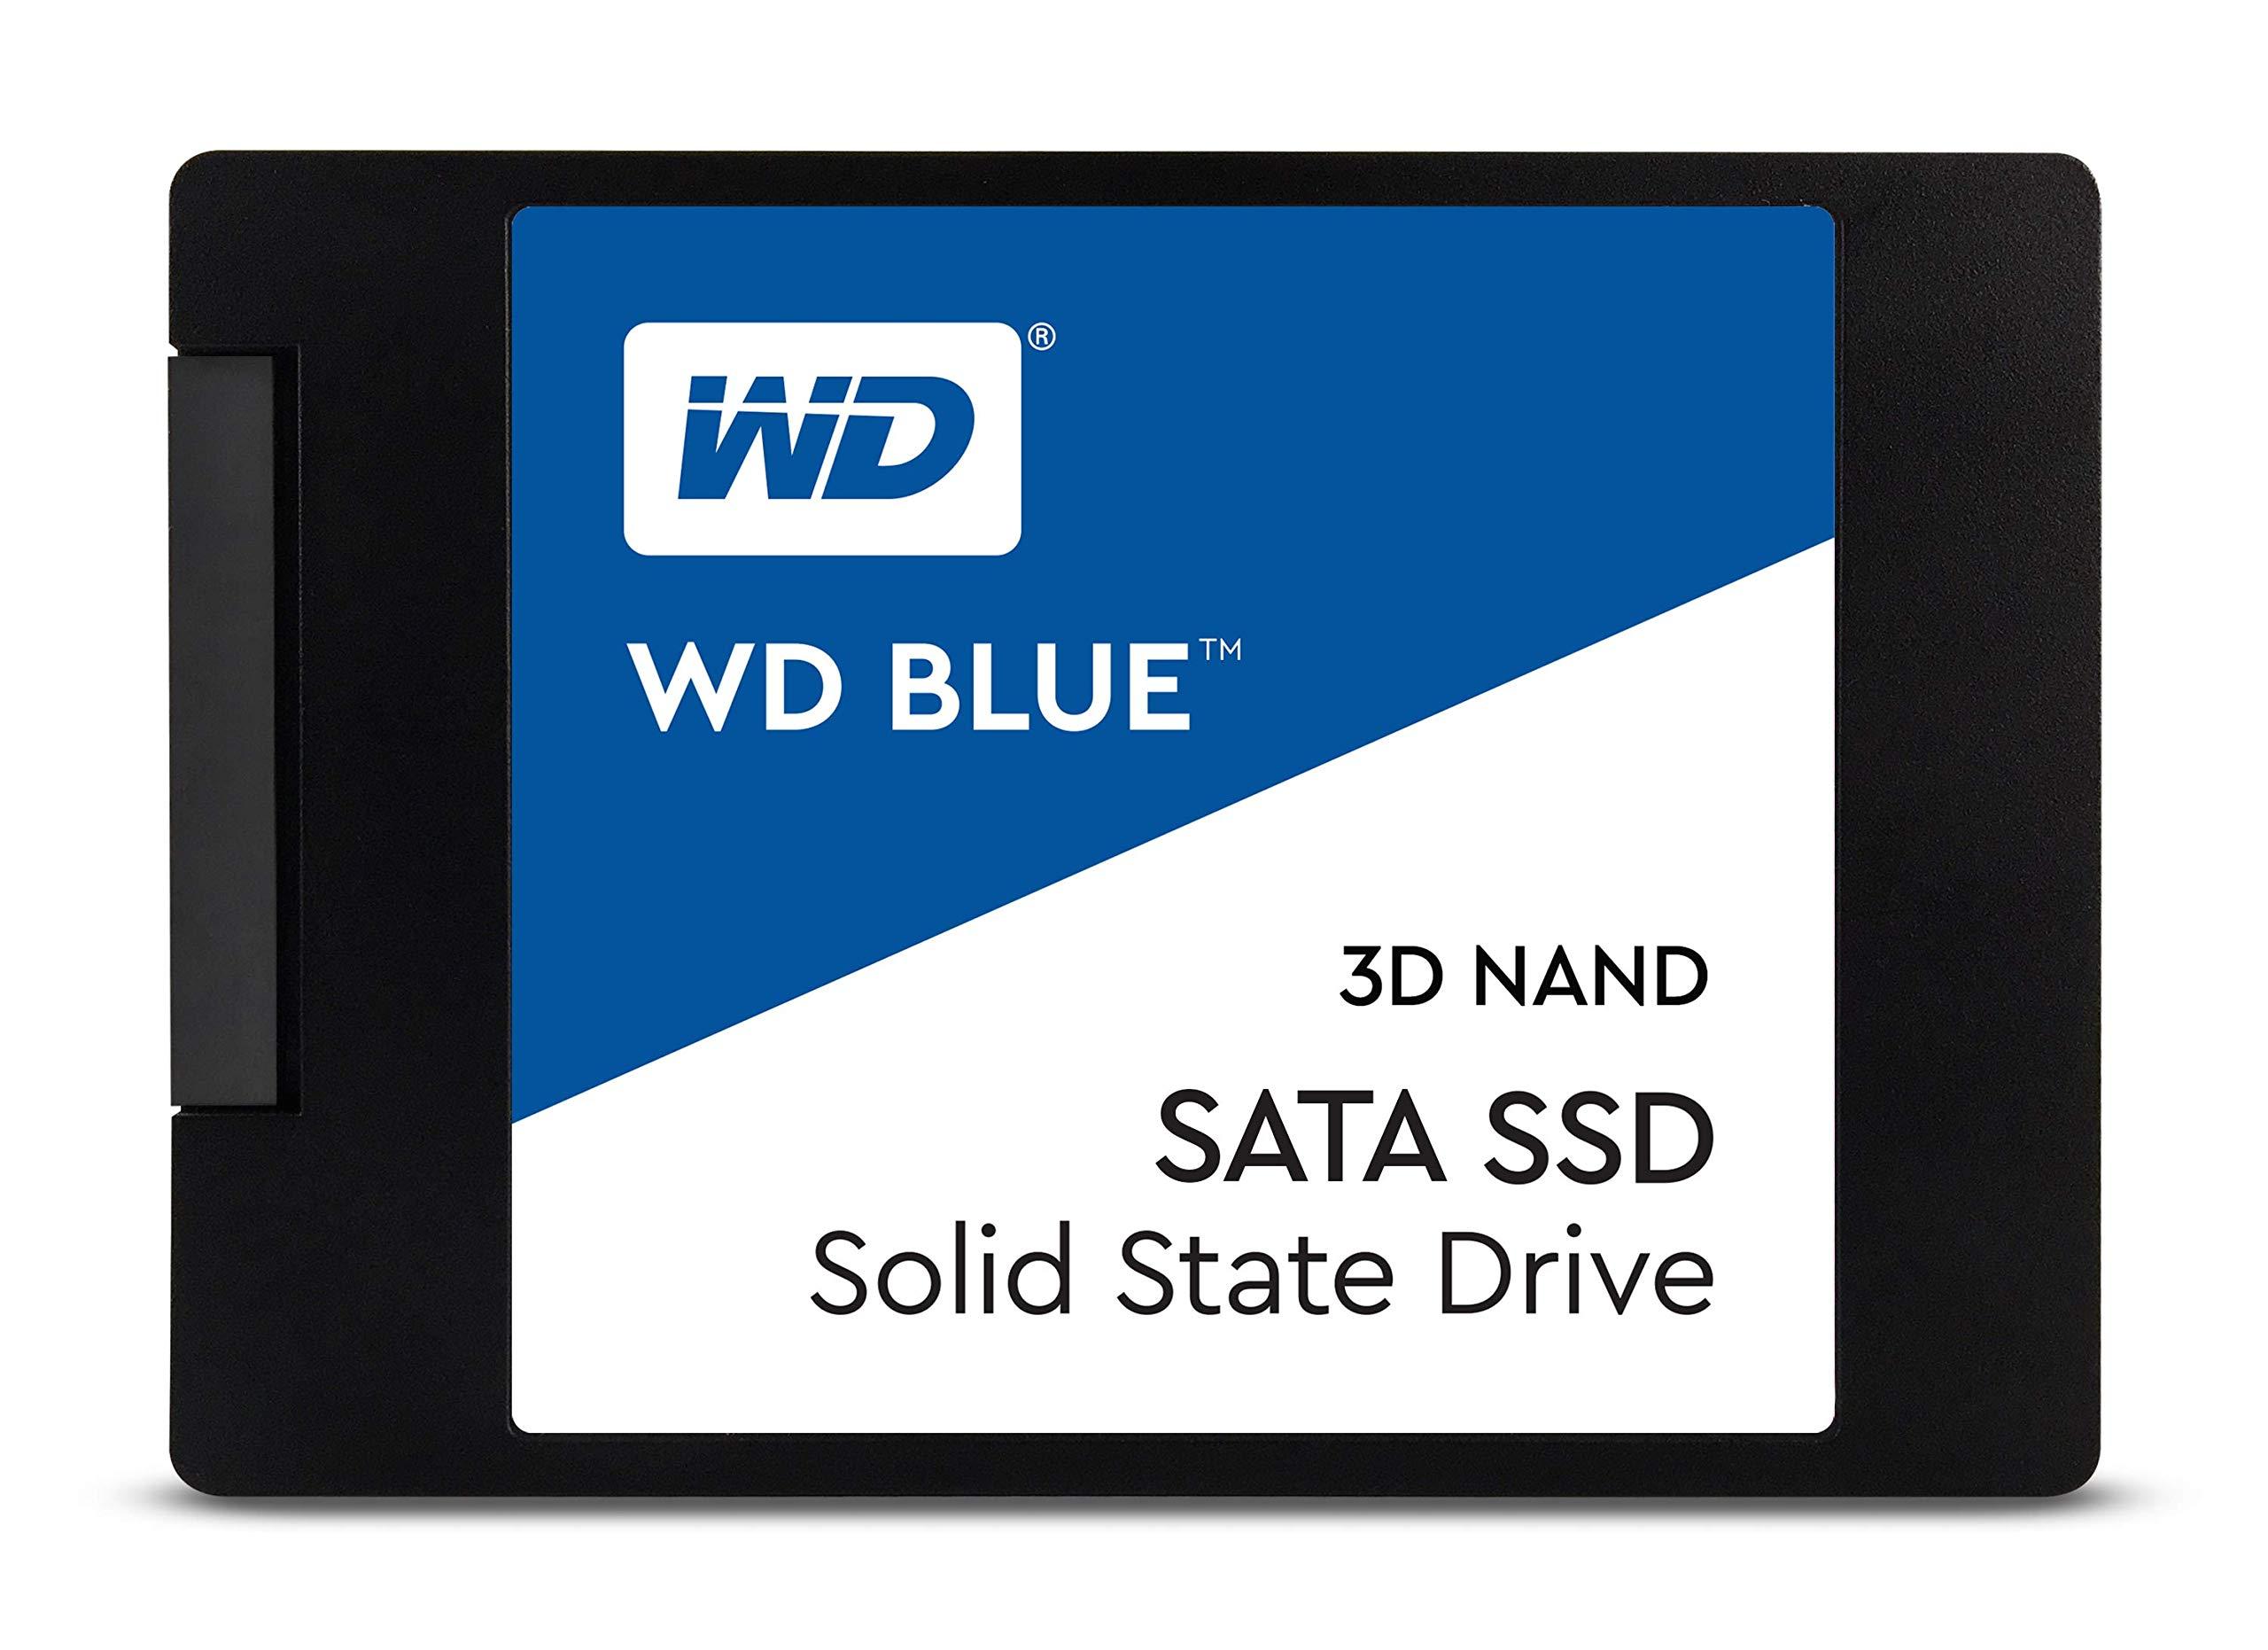 Western-Digital-WD-Blue-3D-NAND-Internal-SSD